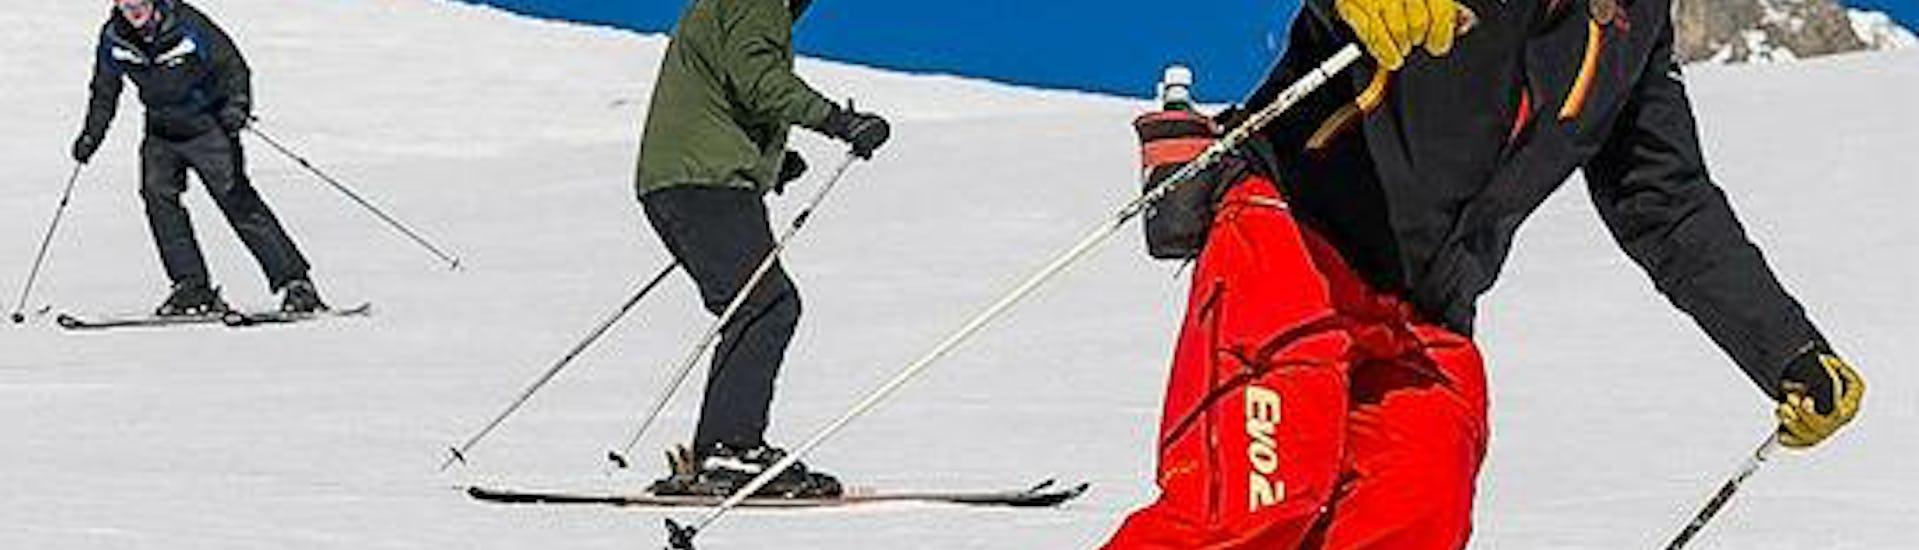 Ski Lessons for Adults - High Season